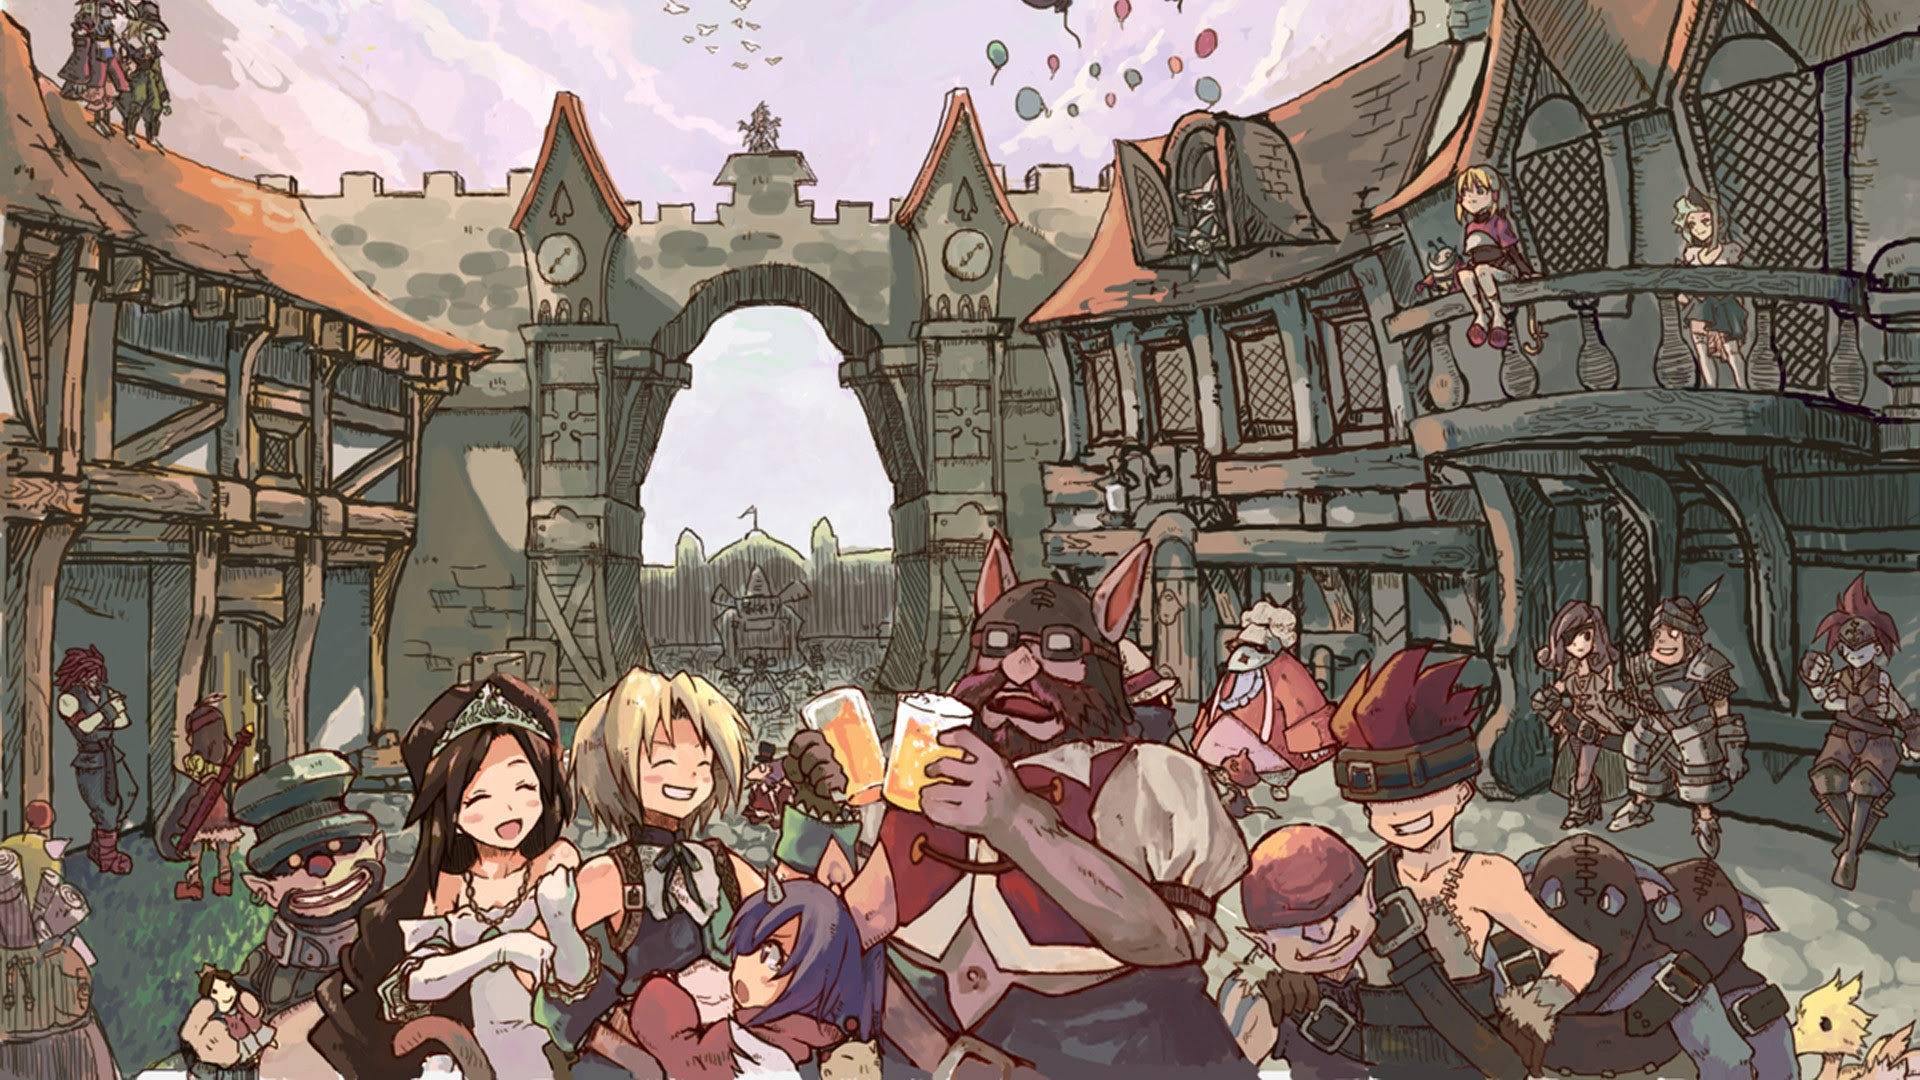 Final Fantasy Ix Wallpapers 72 Images